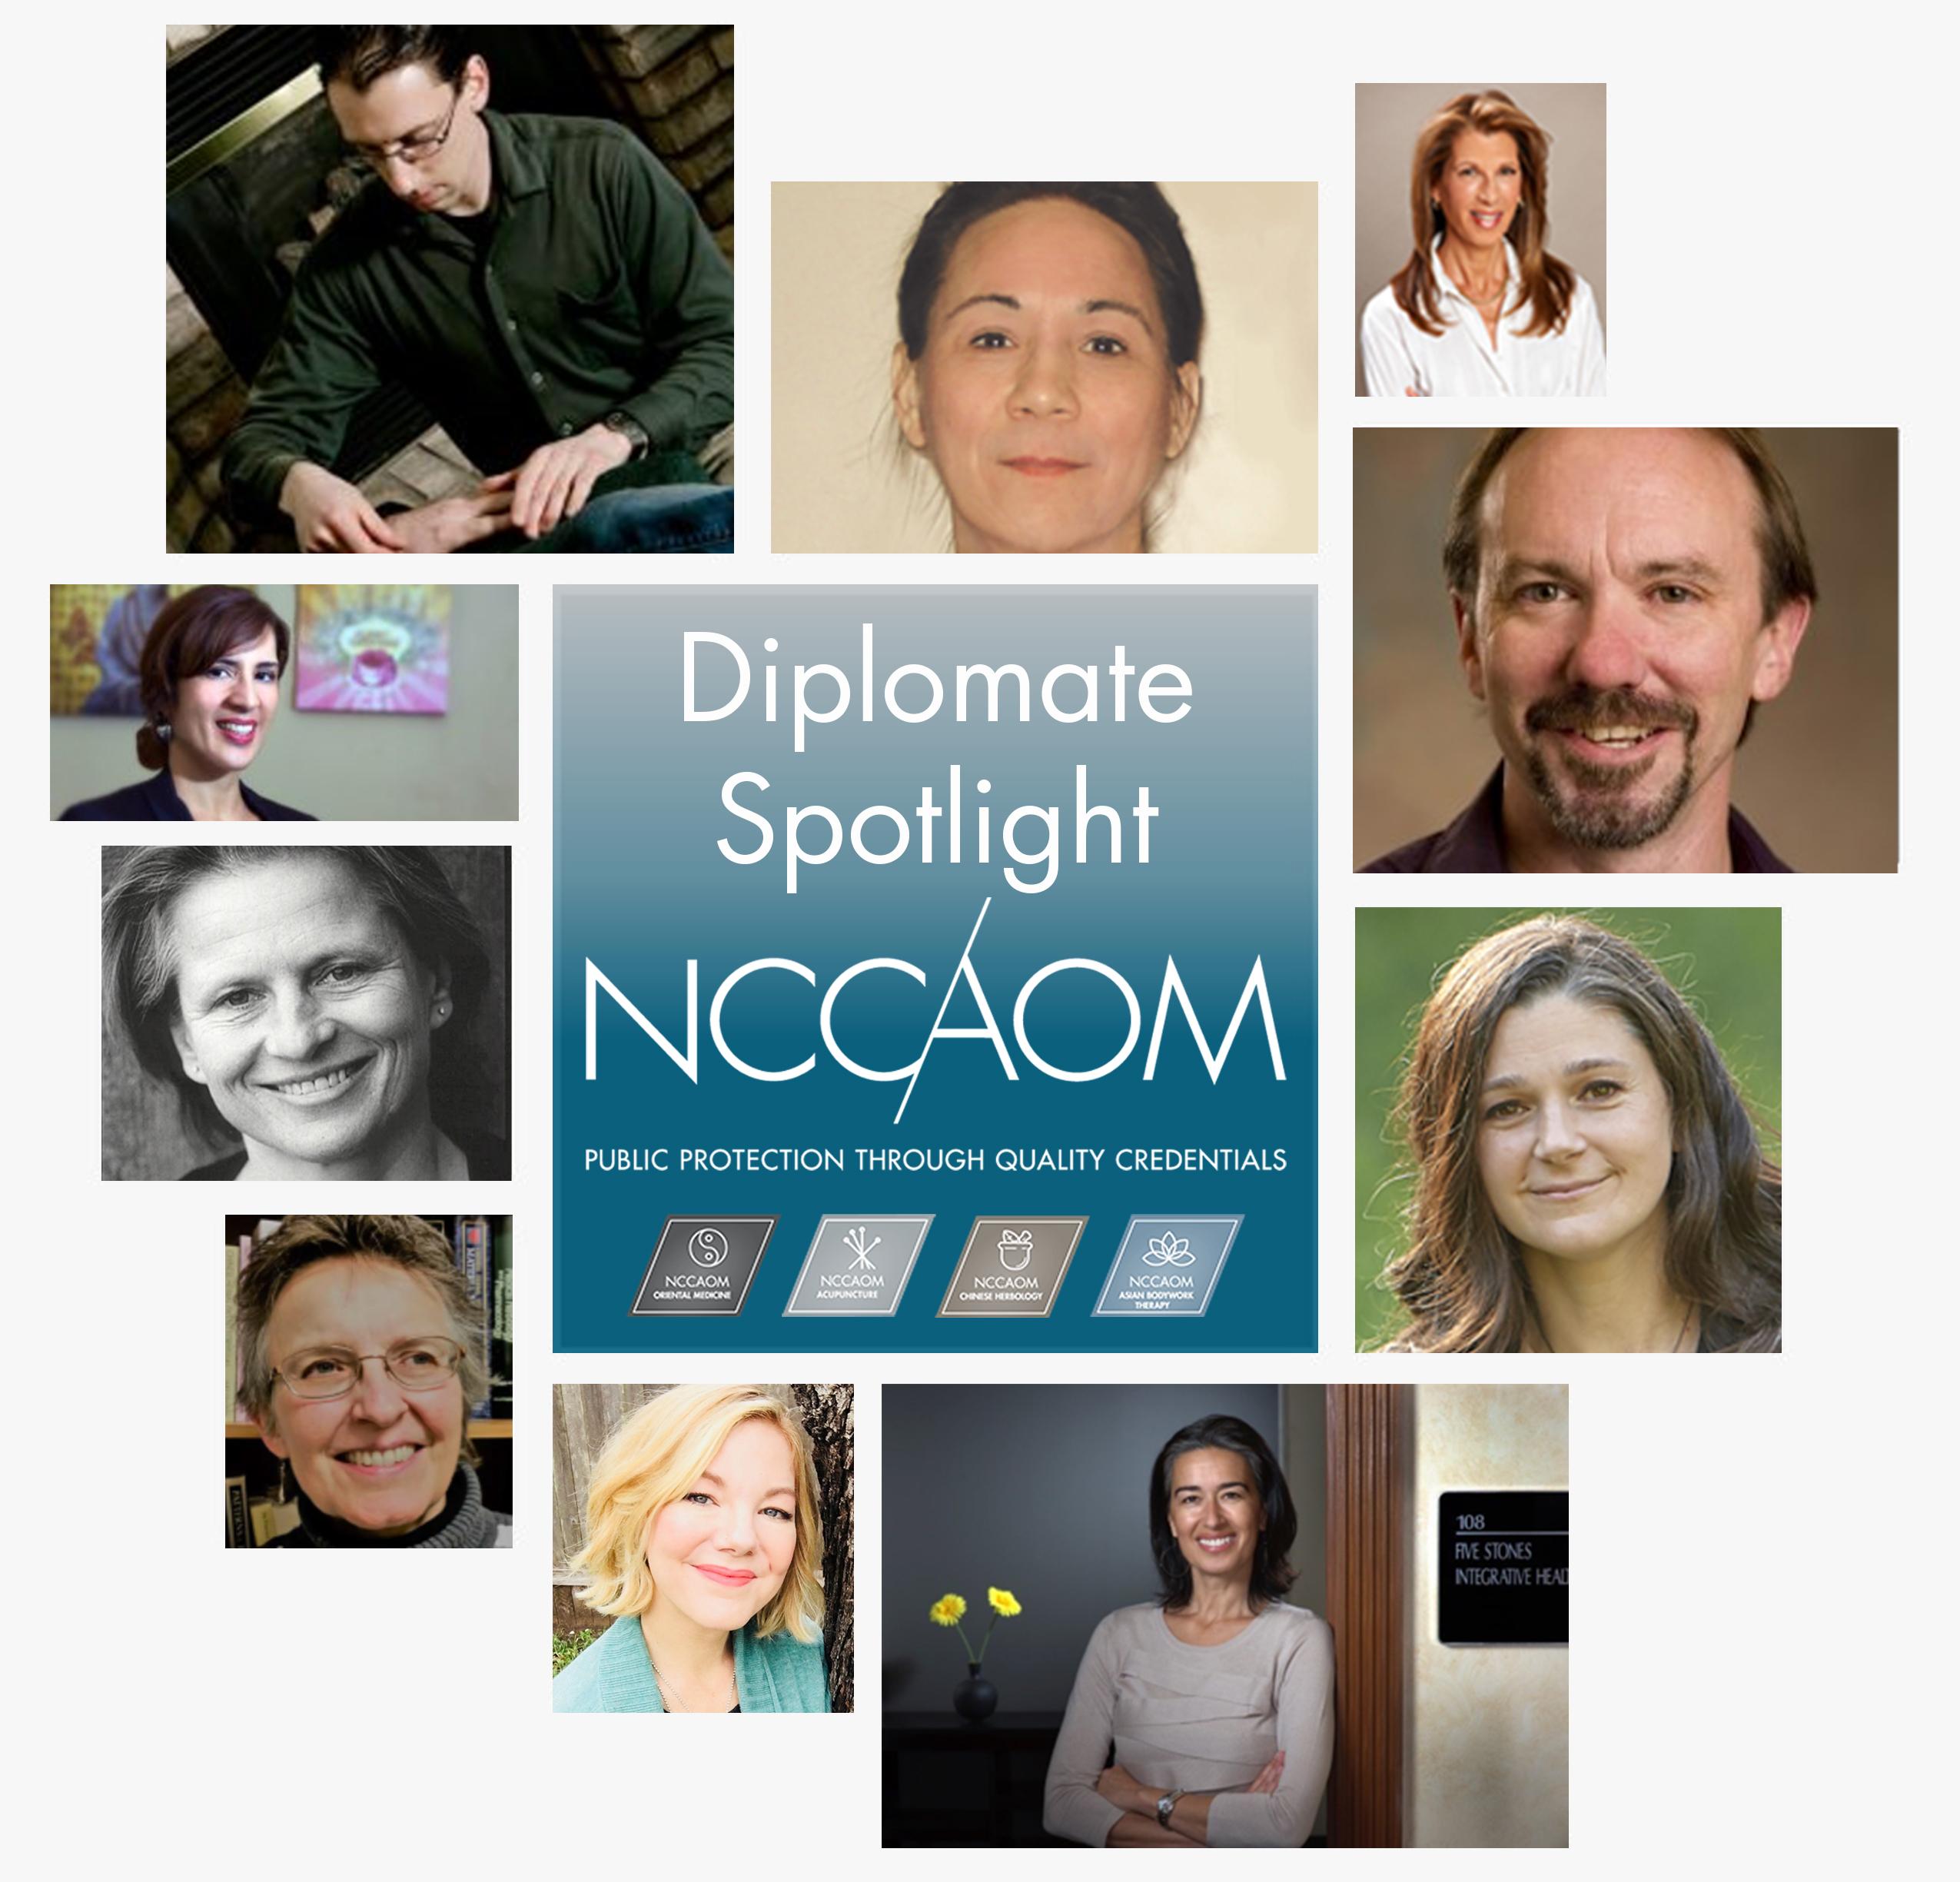 NCCAOM Diplomate Spotlight